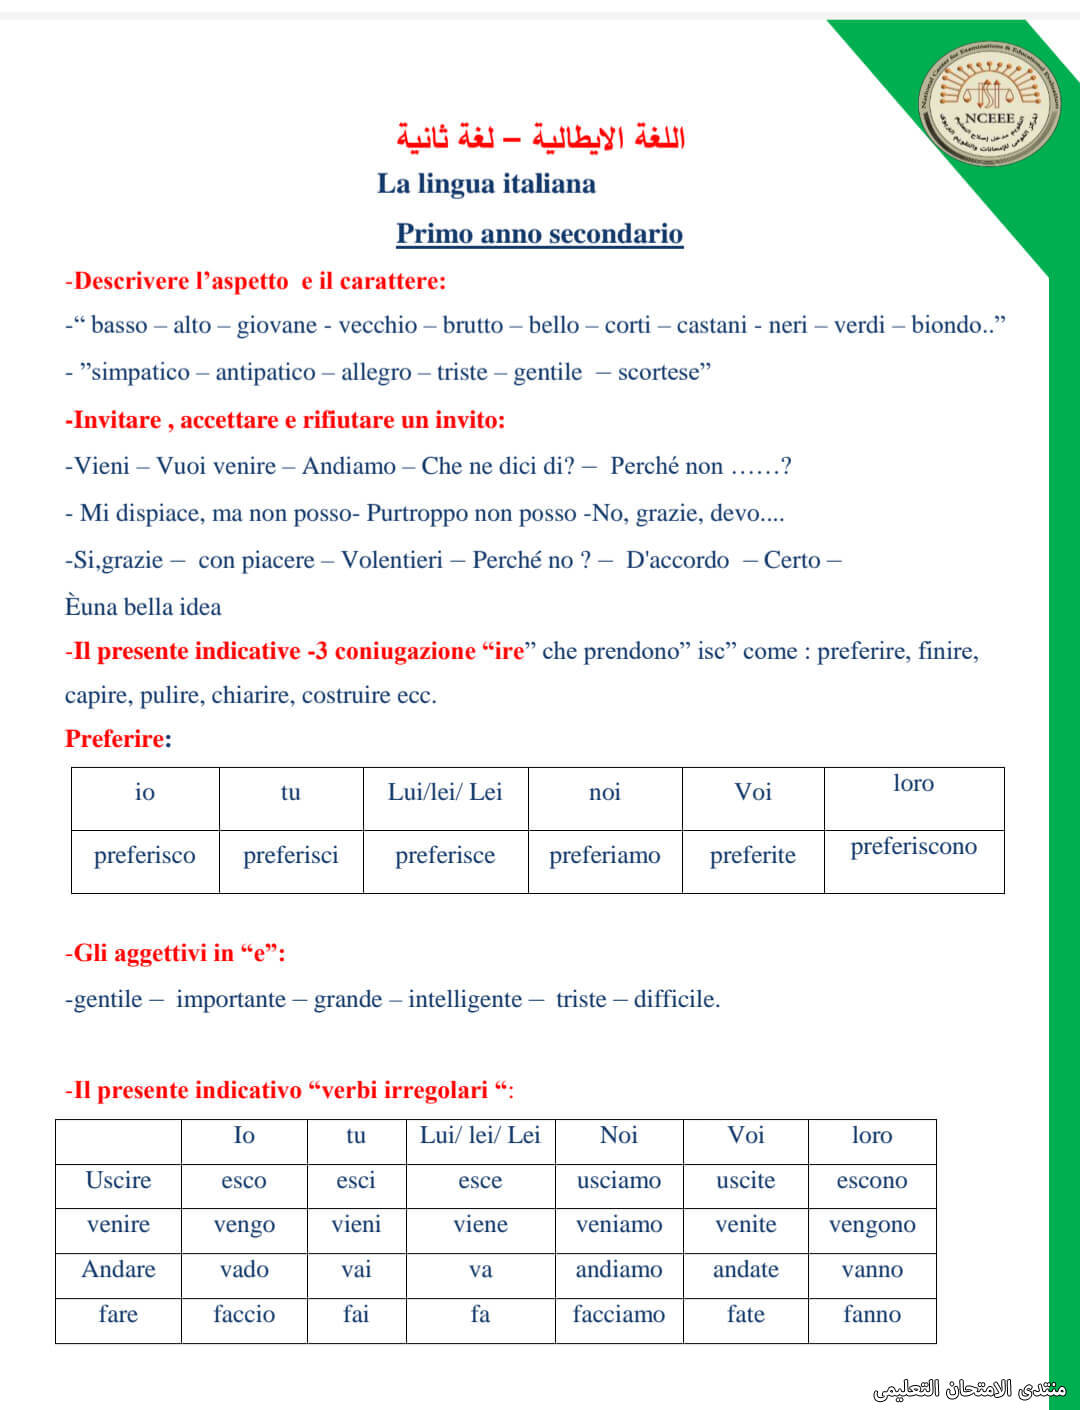 exam-eg.com_161930673323478.jpg